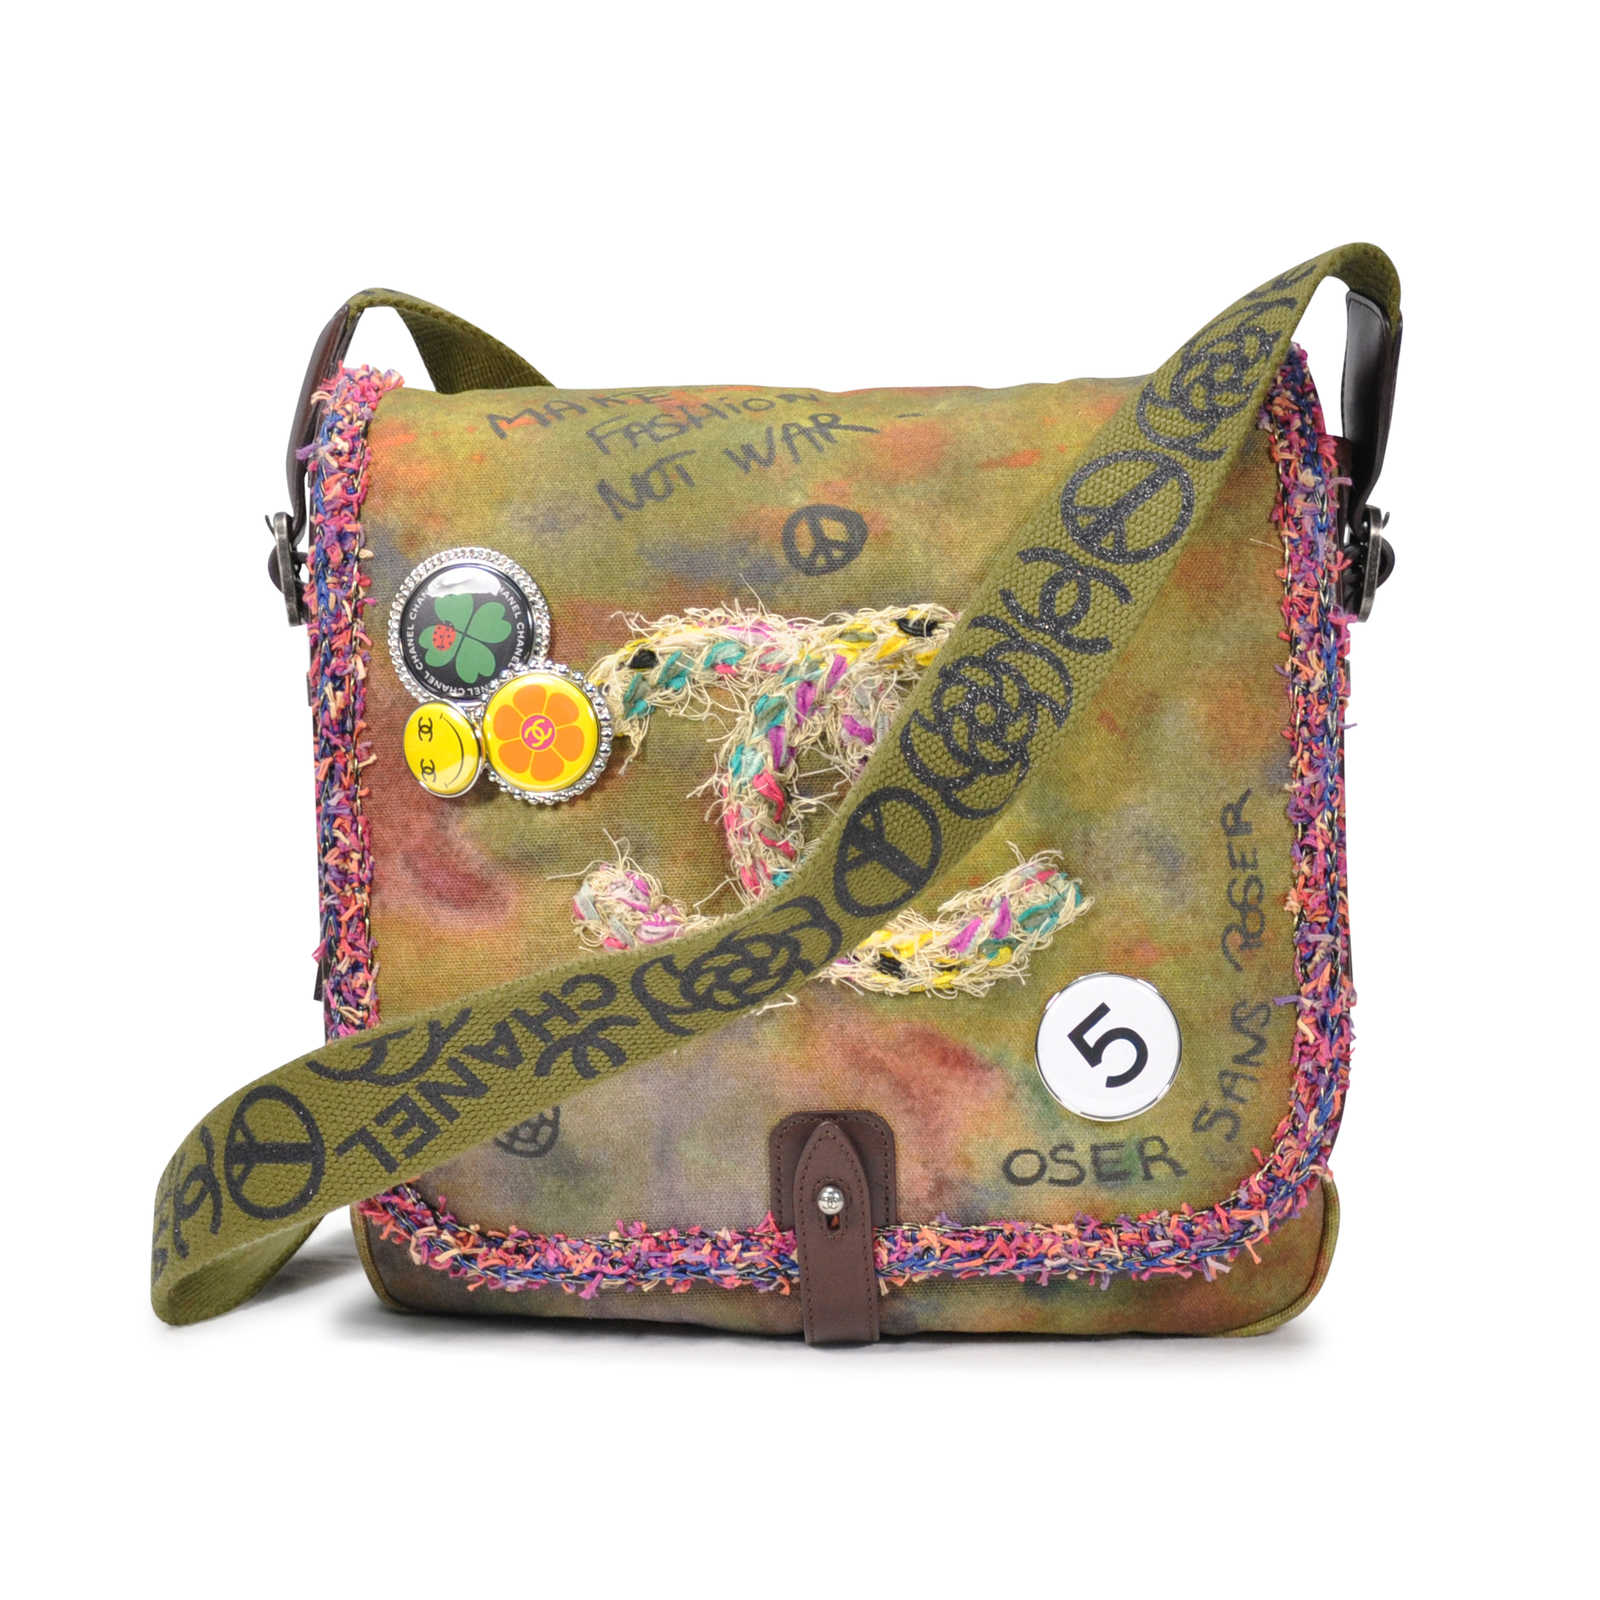 de068ba440a6 Authentic Second Hand Chanel Graffiti on the Pavements Messenger Bag  (PSS-051-00029 ...